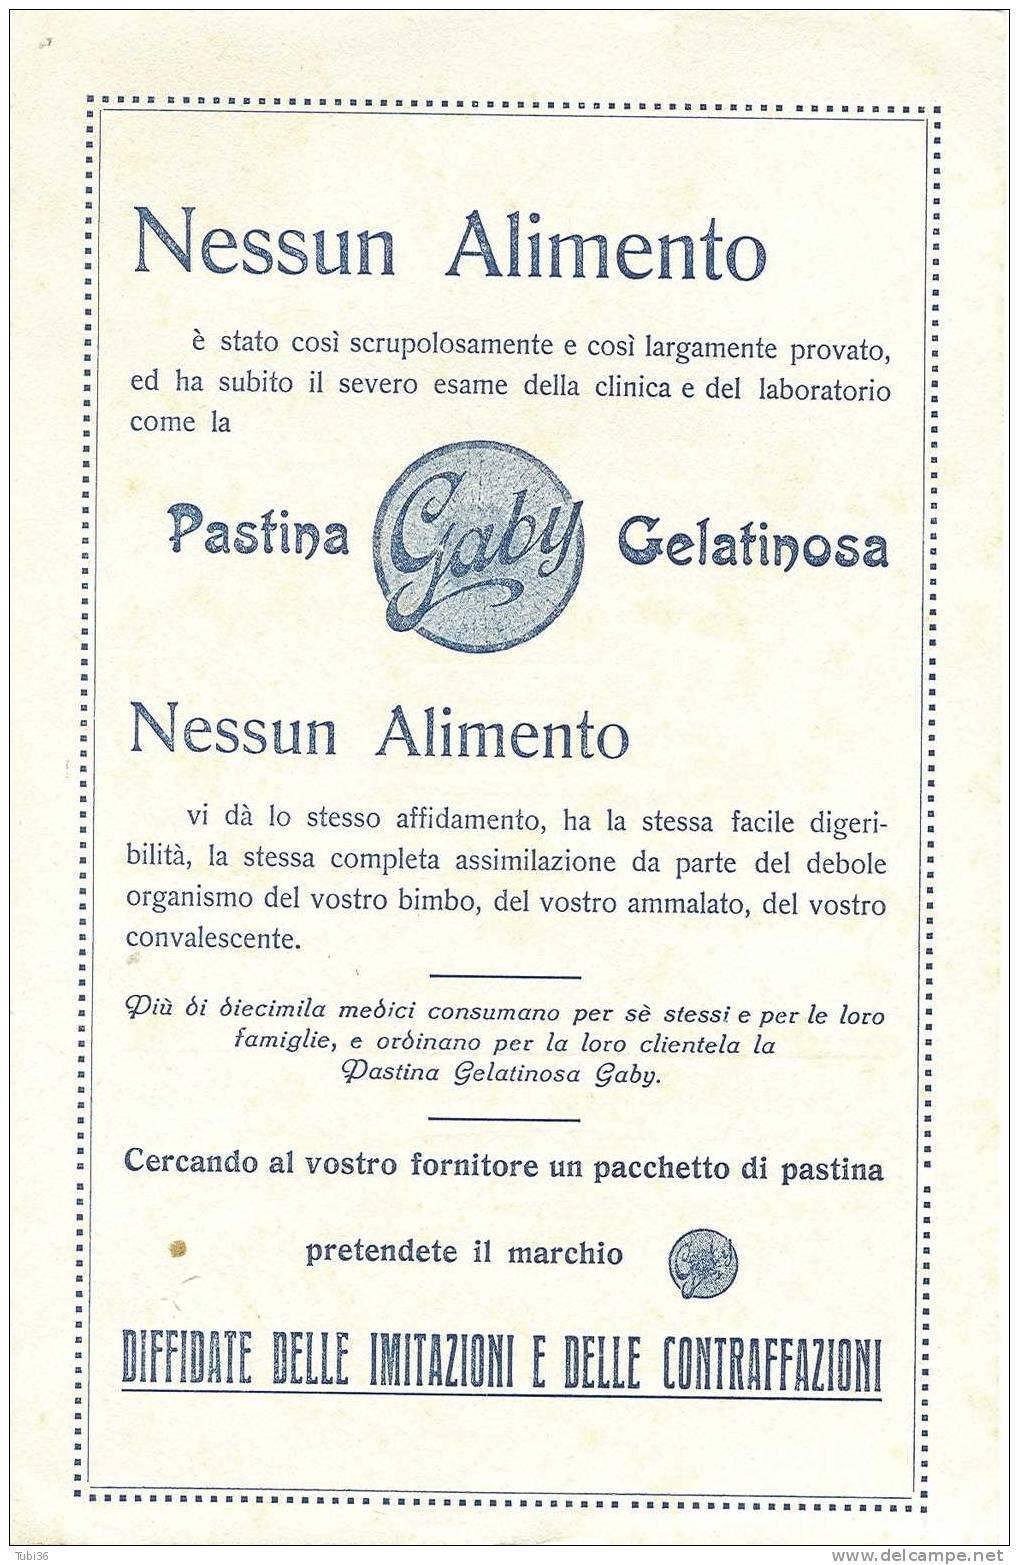 GABY - PASTA GELATINOSA - FOGLIO  CARTA ASSORBENTE  PUBBLICITARIA  CM. 23 X 15 - Alimentare